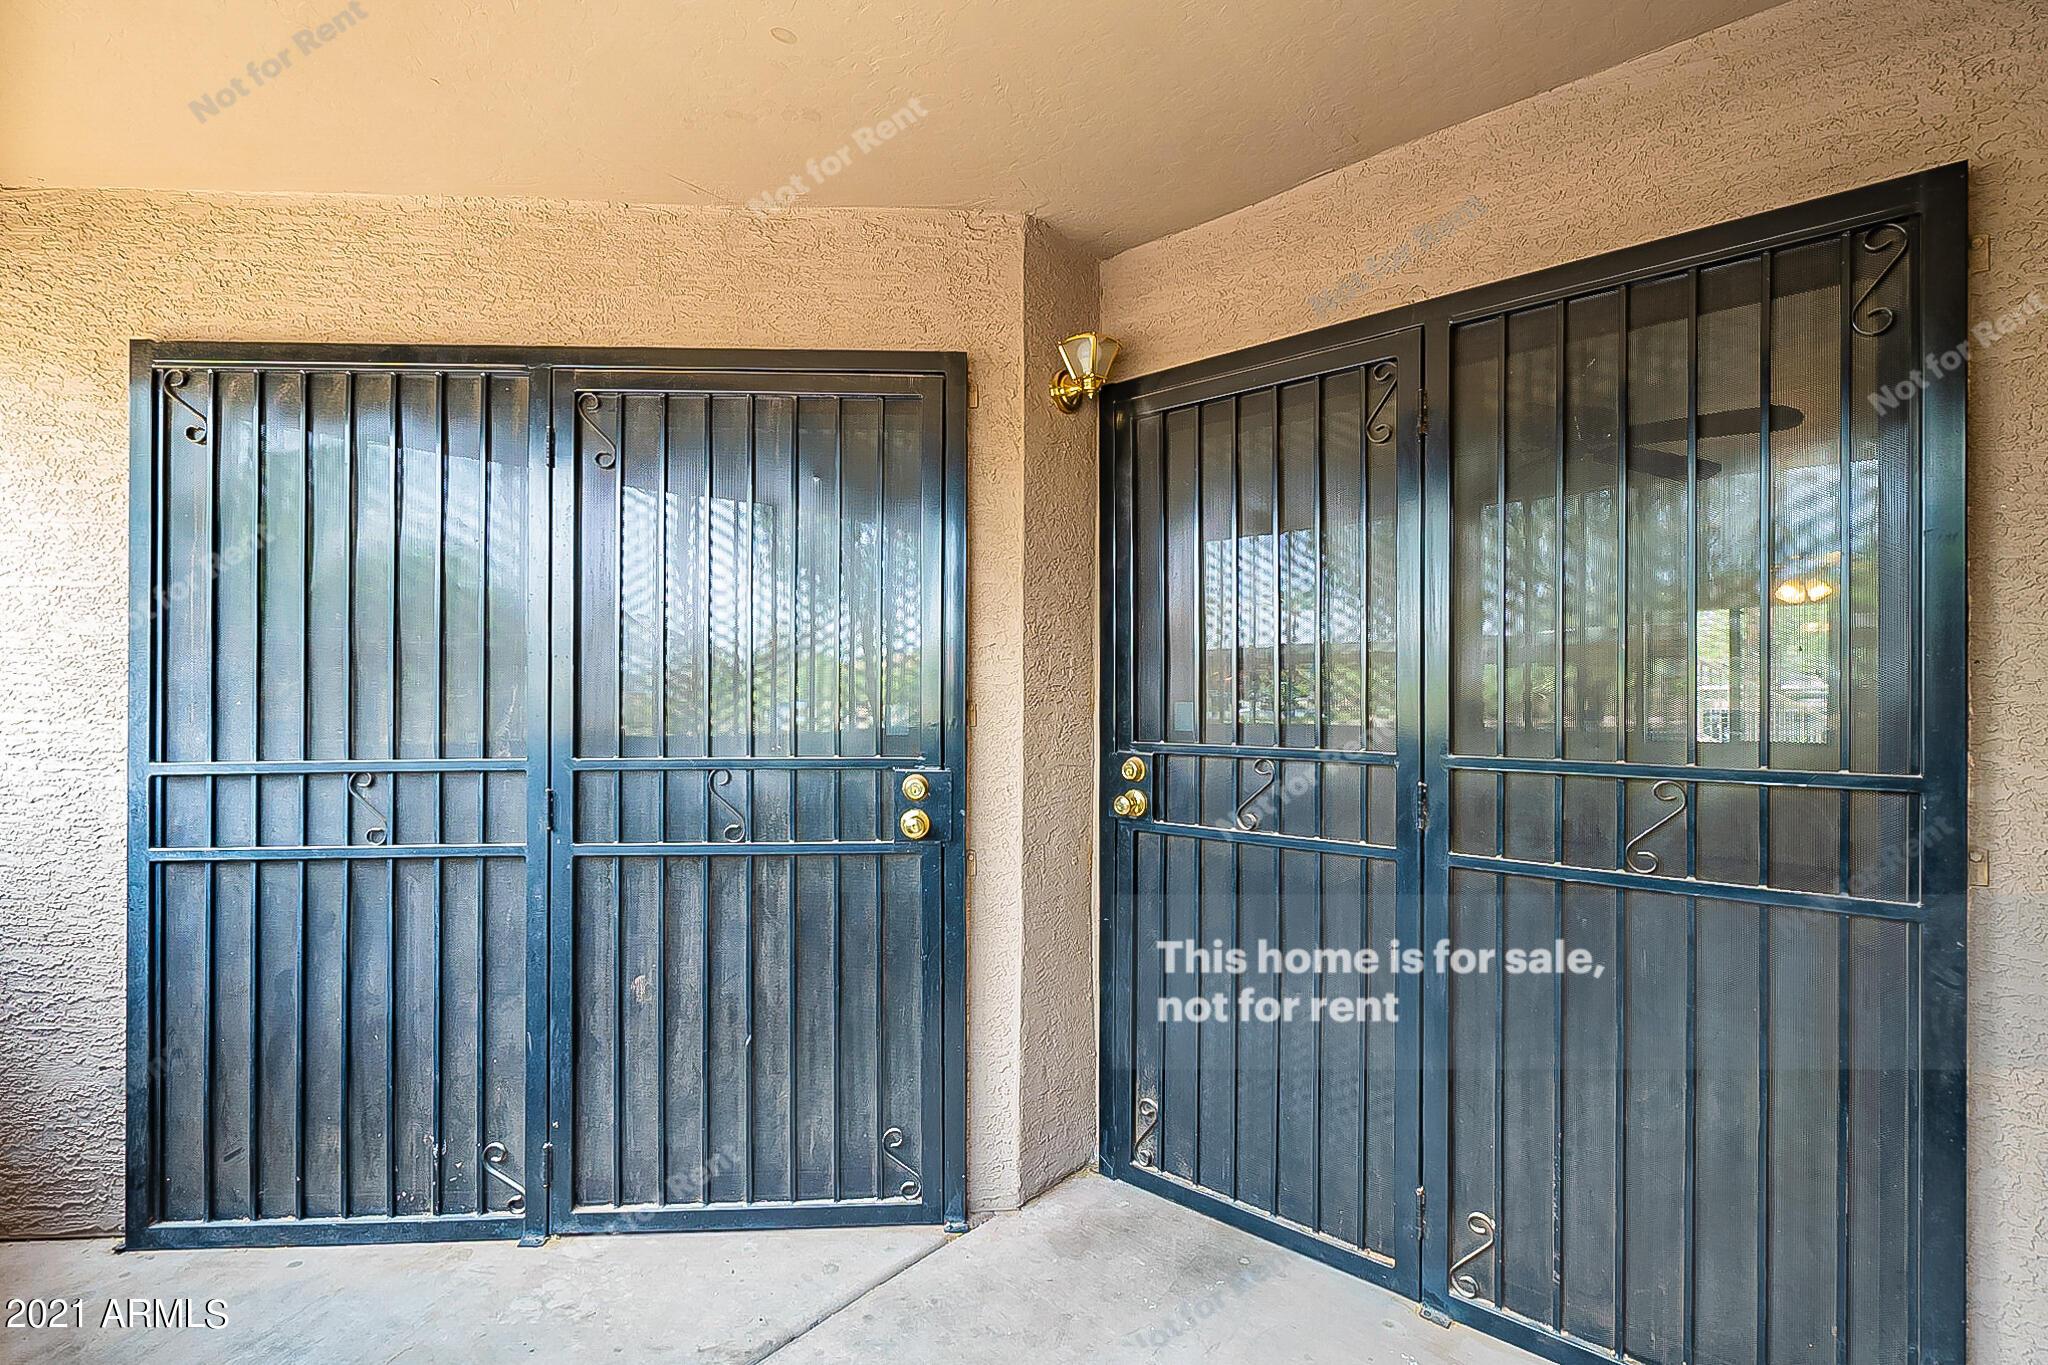 MLS 6268534 1287 N ALMA SCHOOL Road Unit 153, Chandler, AZ 85224 Chandler AZ Condominium